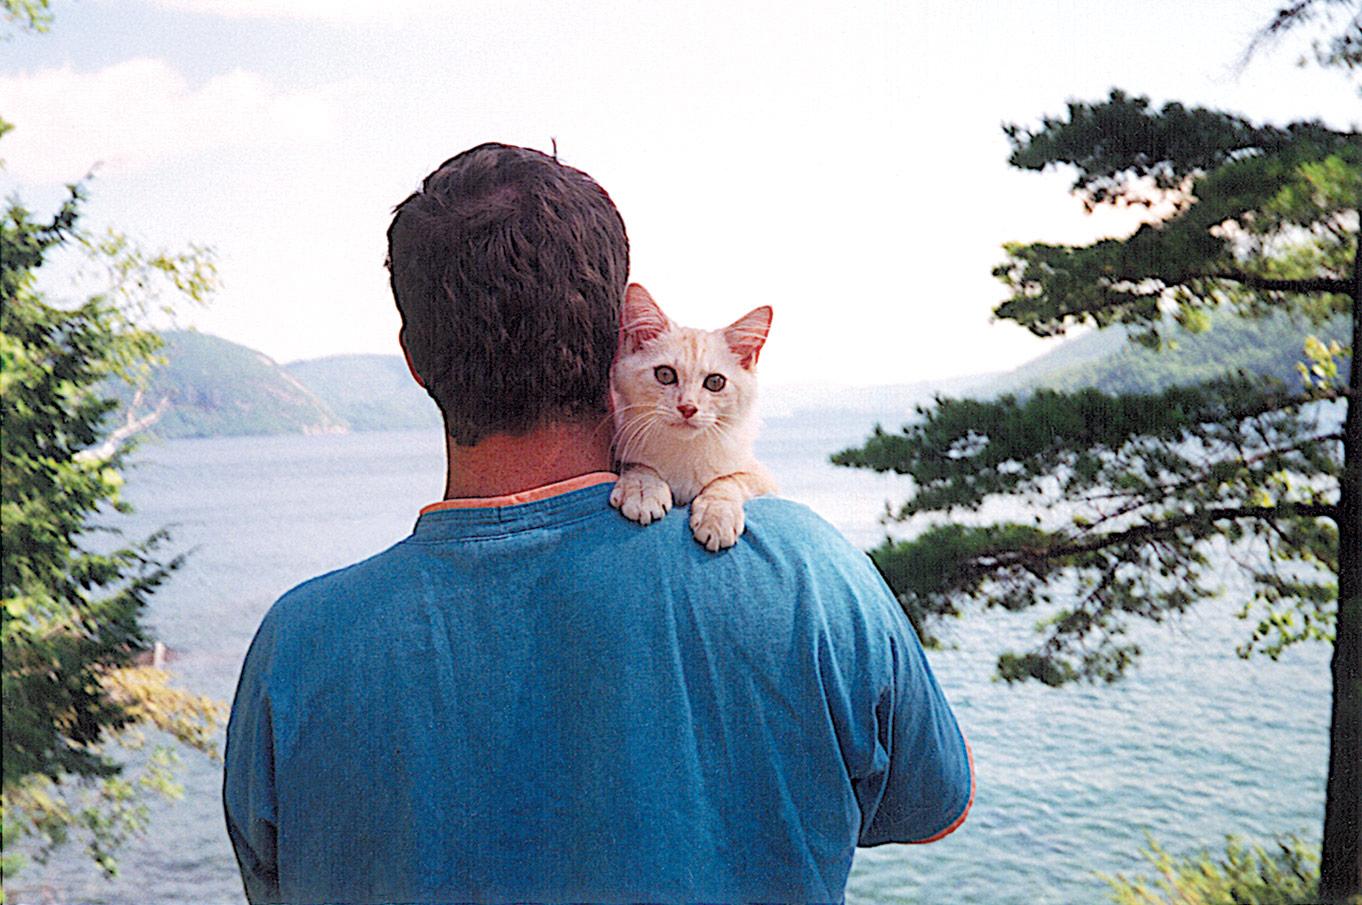 patrick mcfeeley photographer for american windsurfer magazine